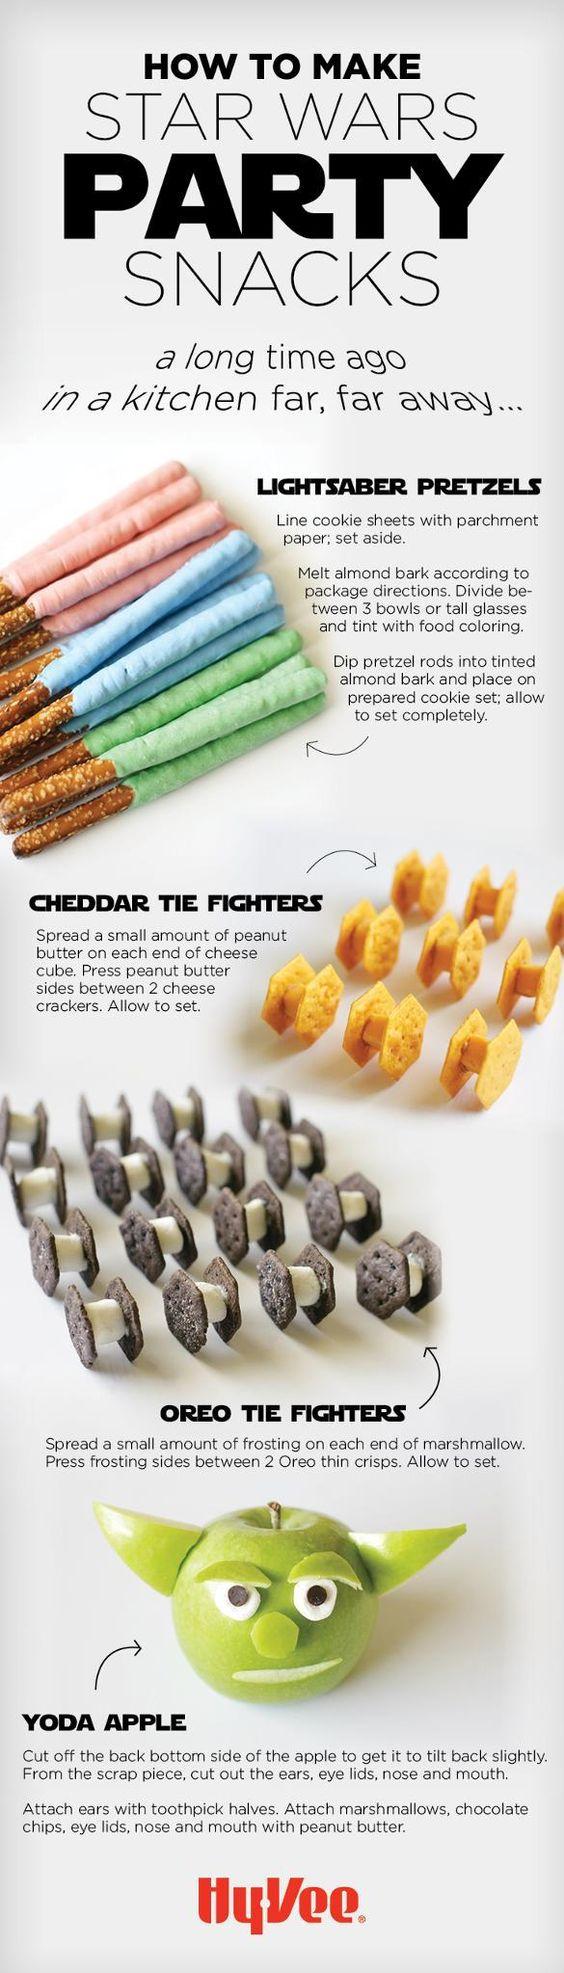 Fiesta Star Wars - recetas snacks